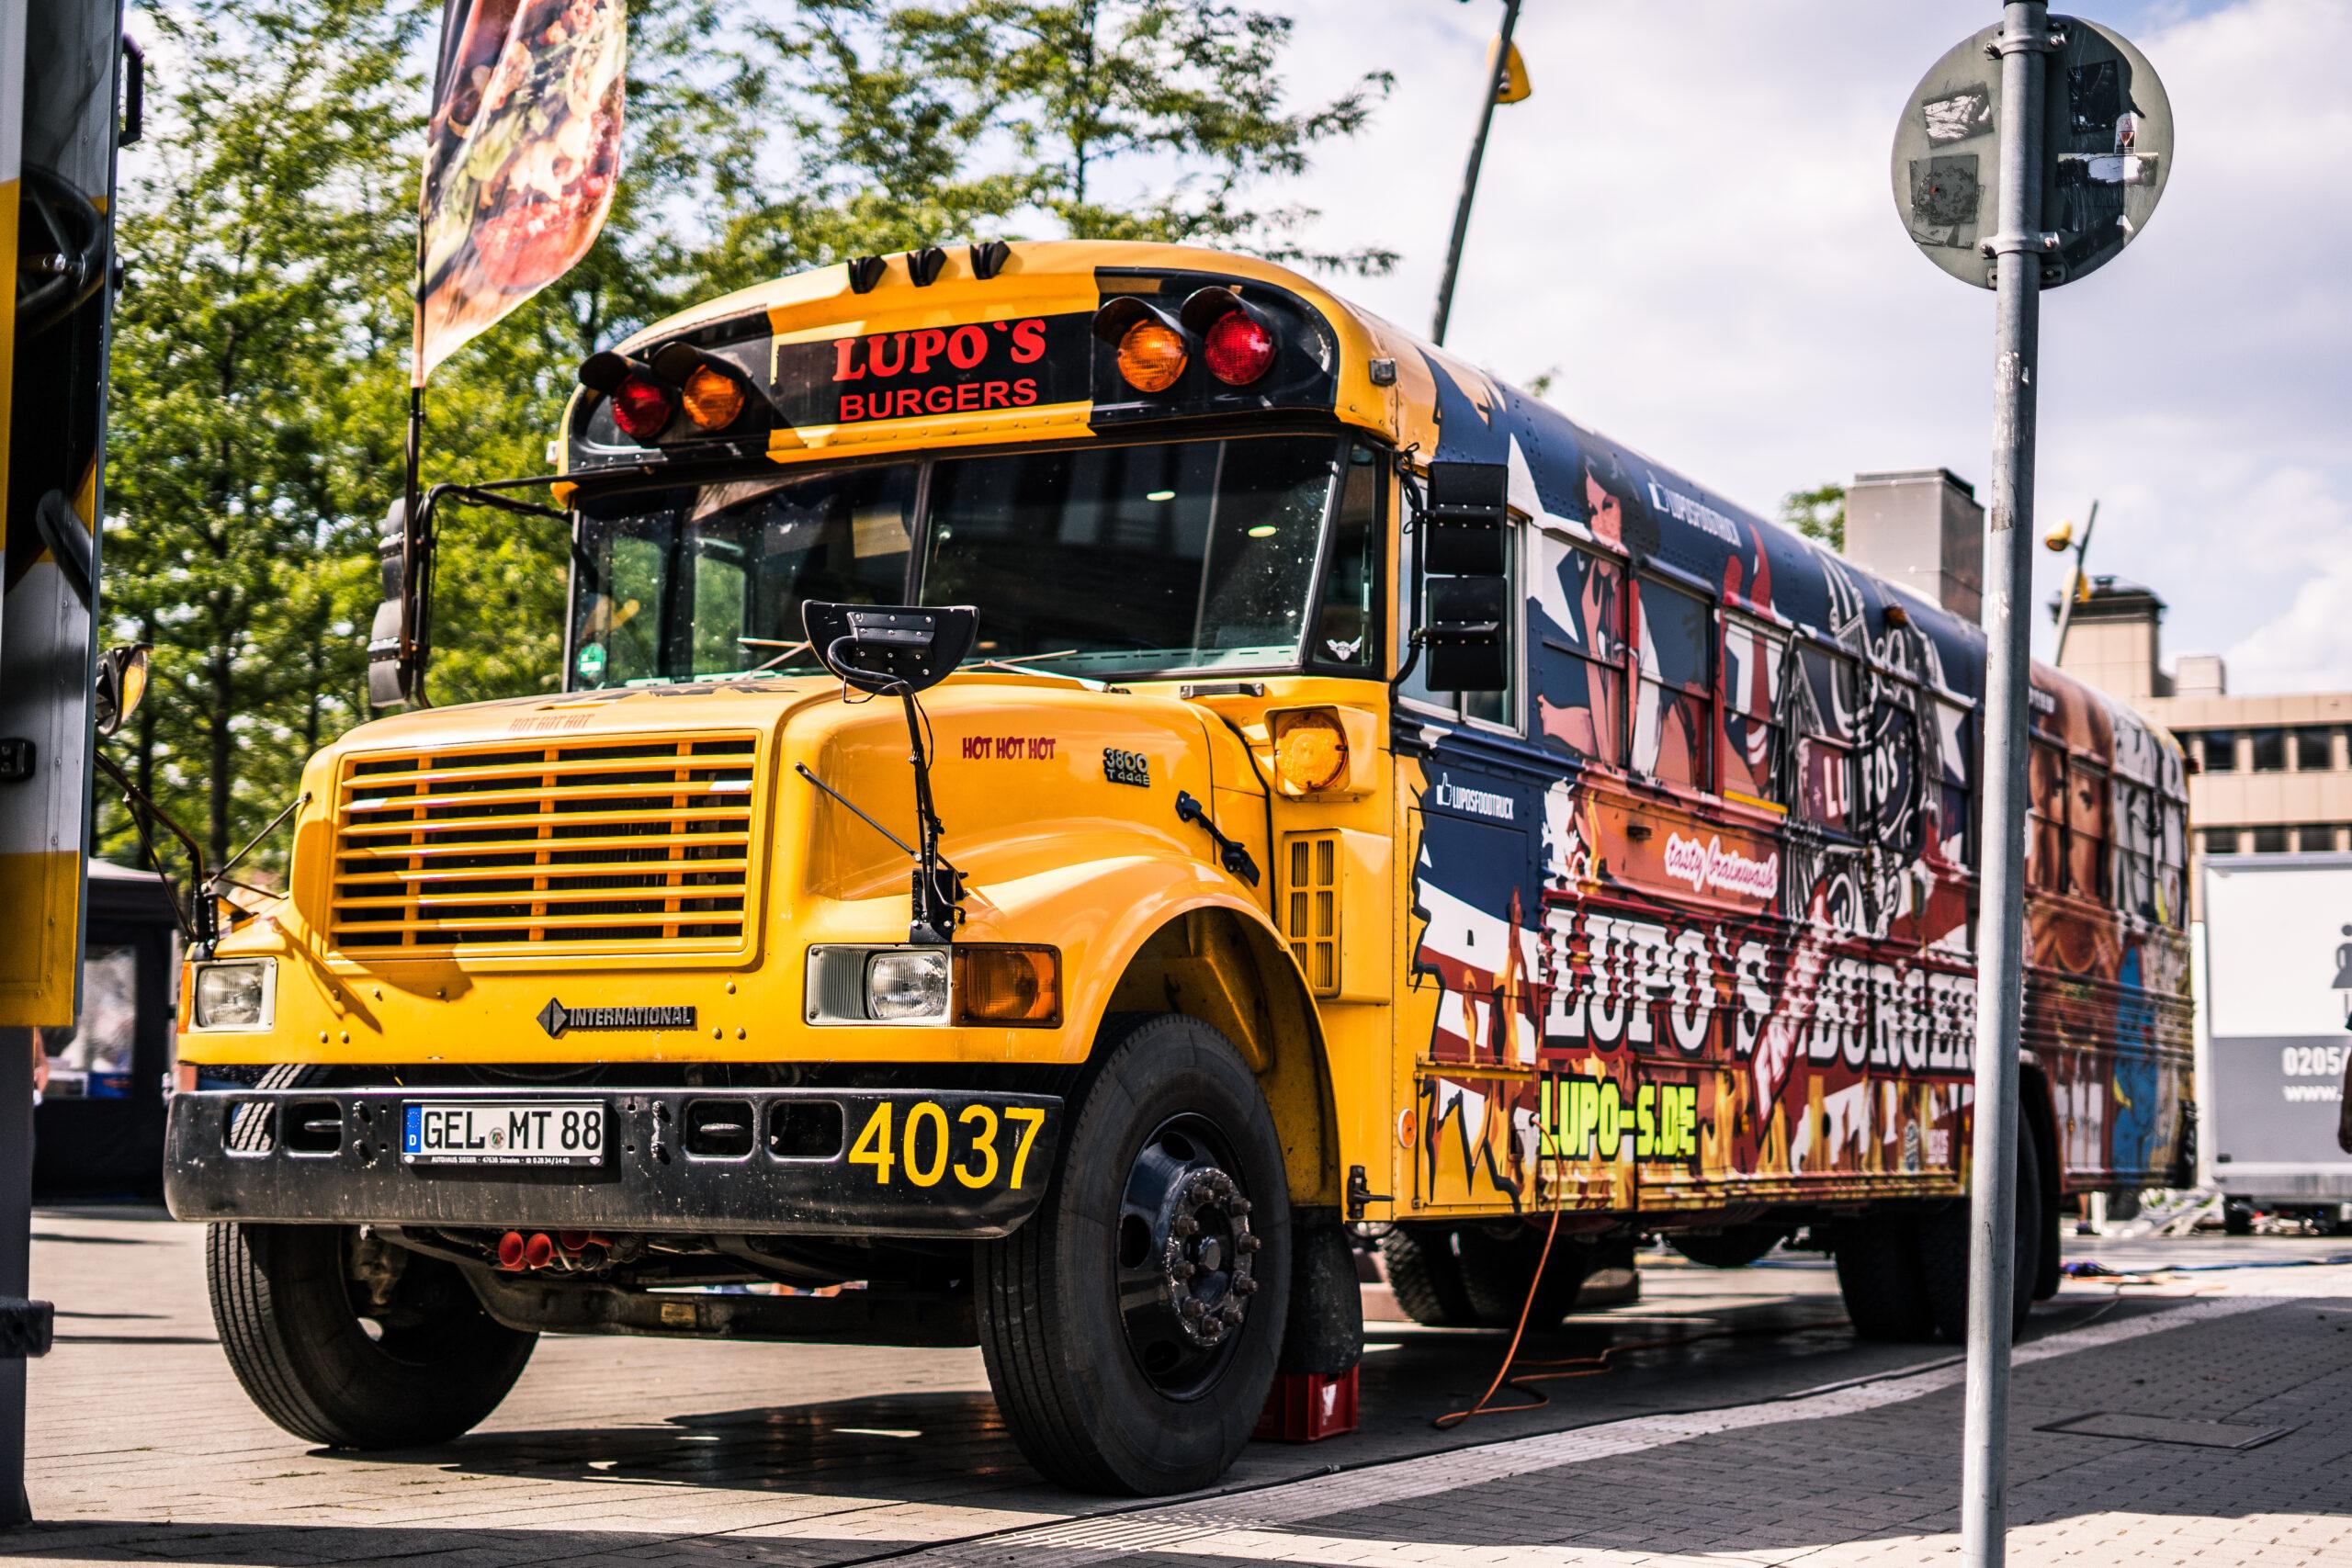 American Food Truck Schulbus bei Food Lovers in Dortmund